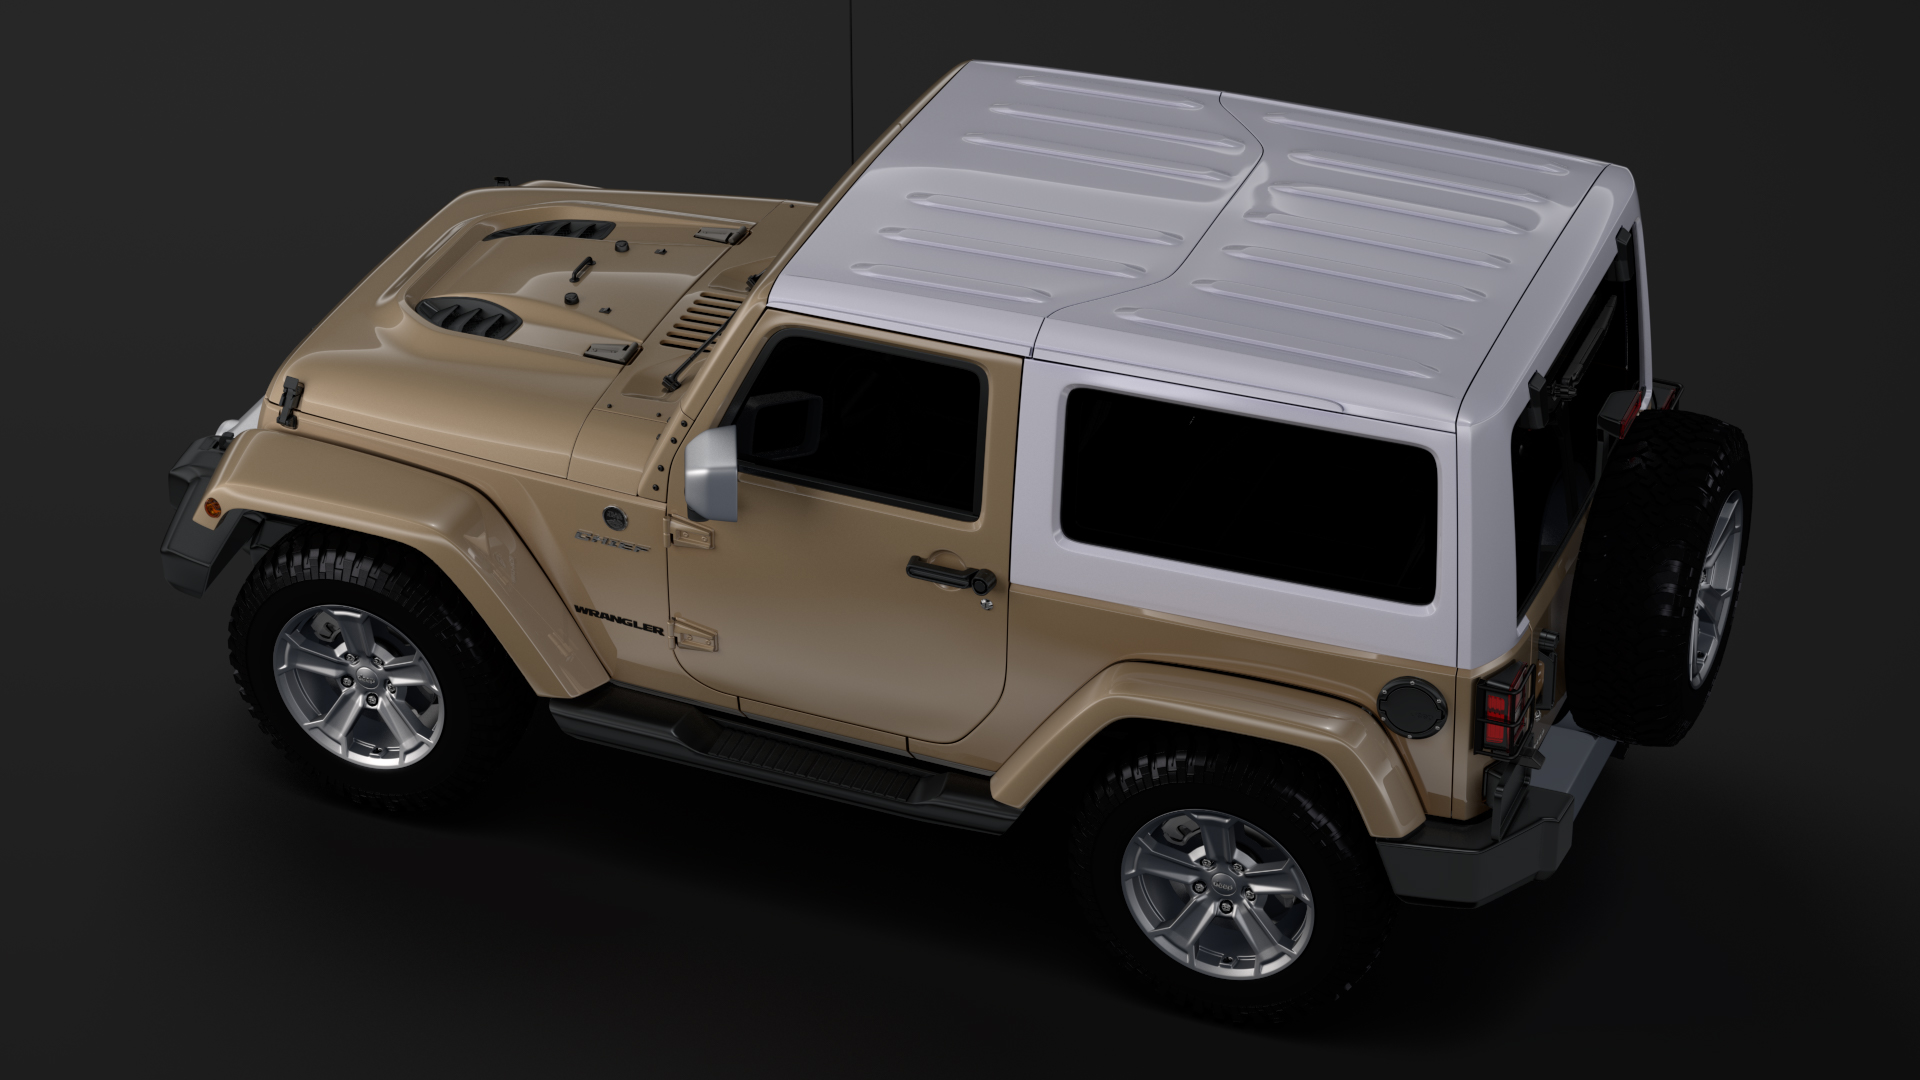 jeep wrangler chief jk 2017 3d model max fbx c4d lwo ma mb hrc xsi obj 276884